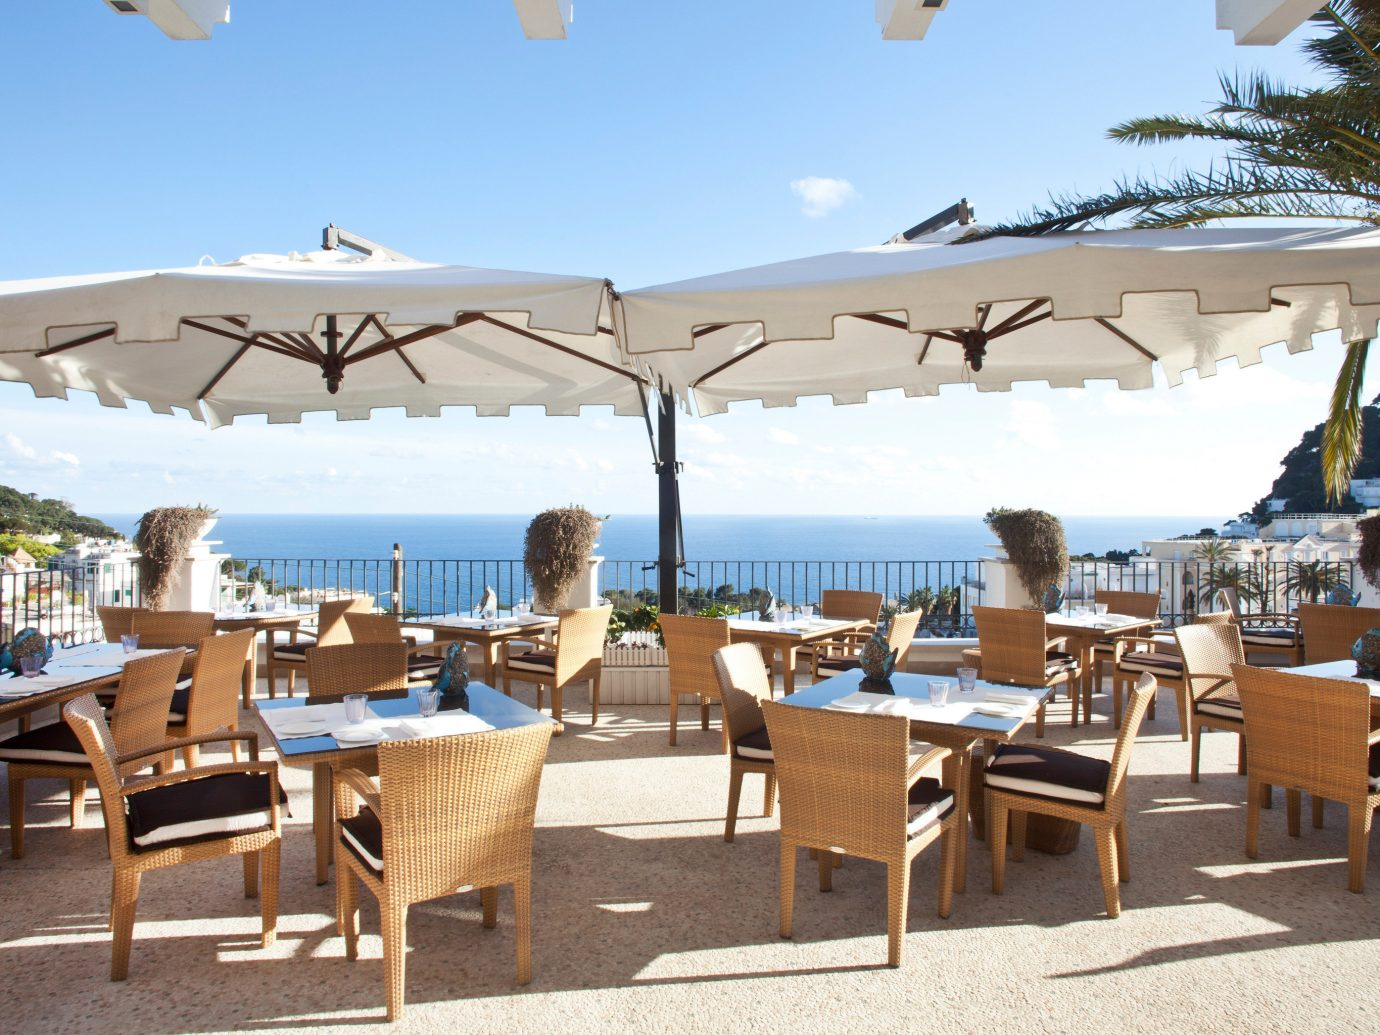 Outdoor dining at Capri Tiberio Palace, Capri